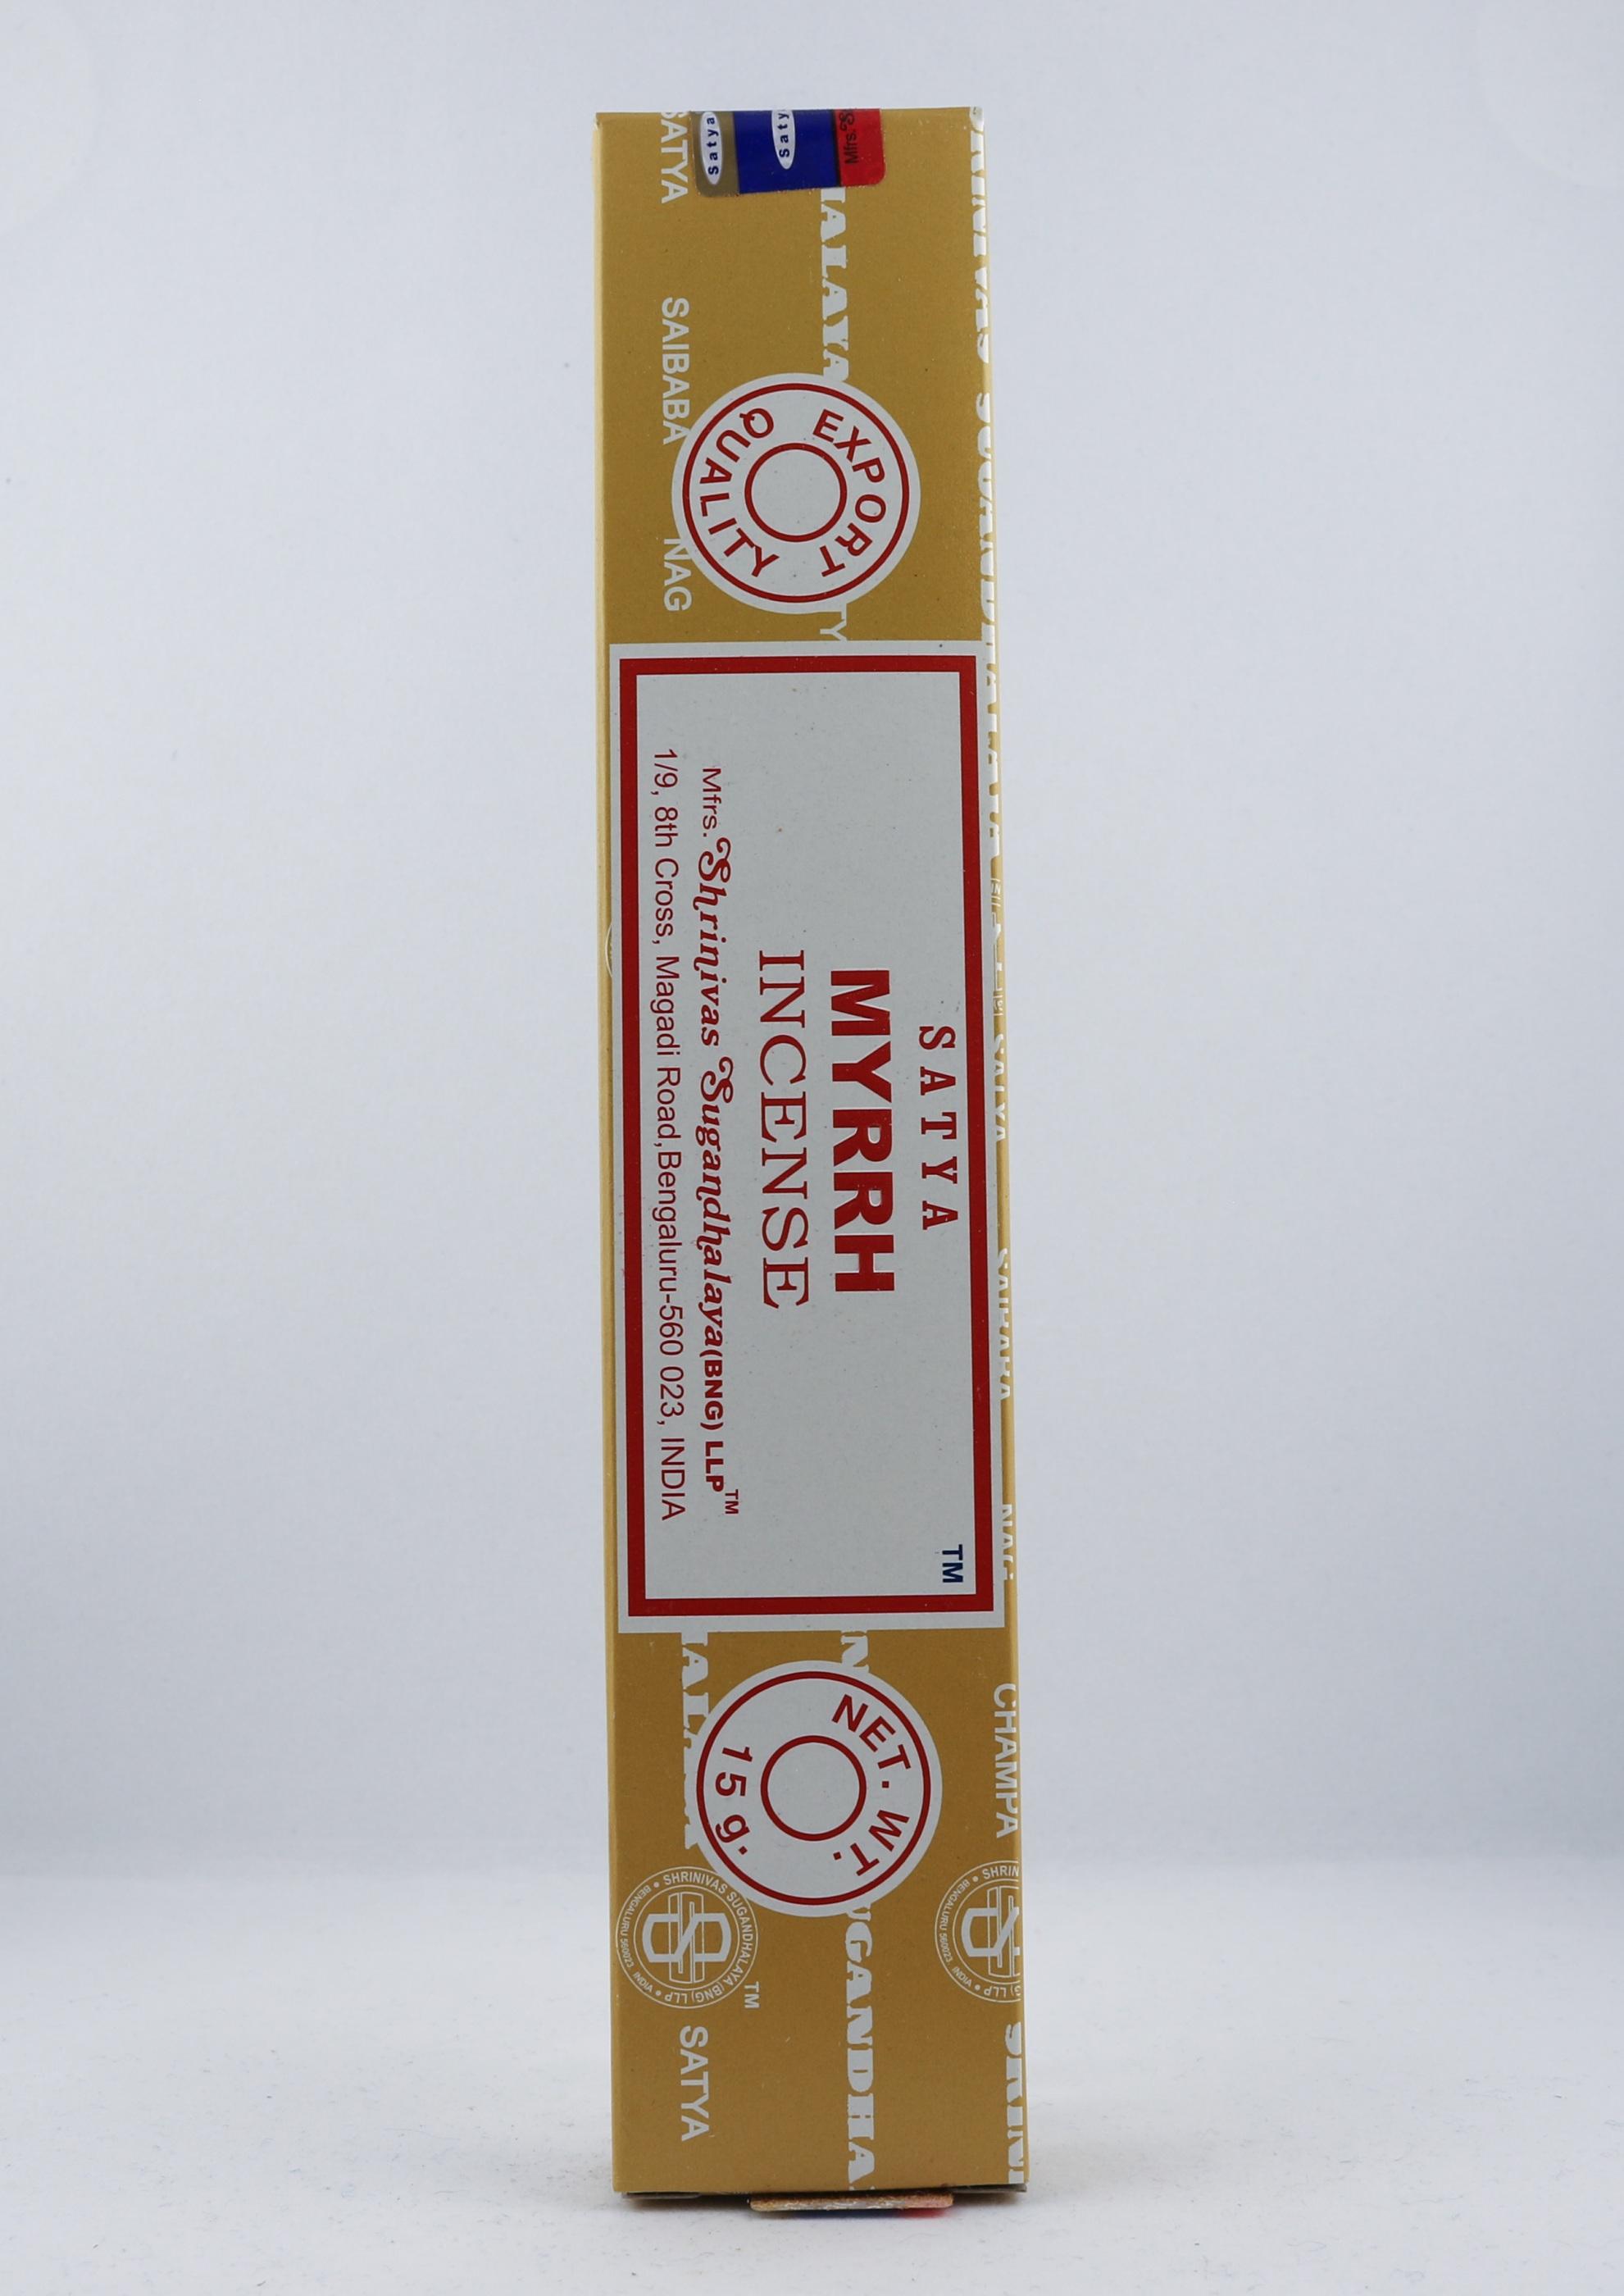 Myrrh rökelse wellness ayurveda halmstad sweden svensk aroma aromer